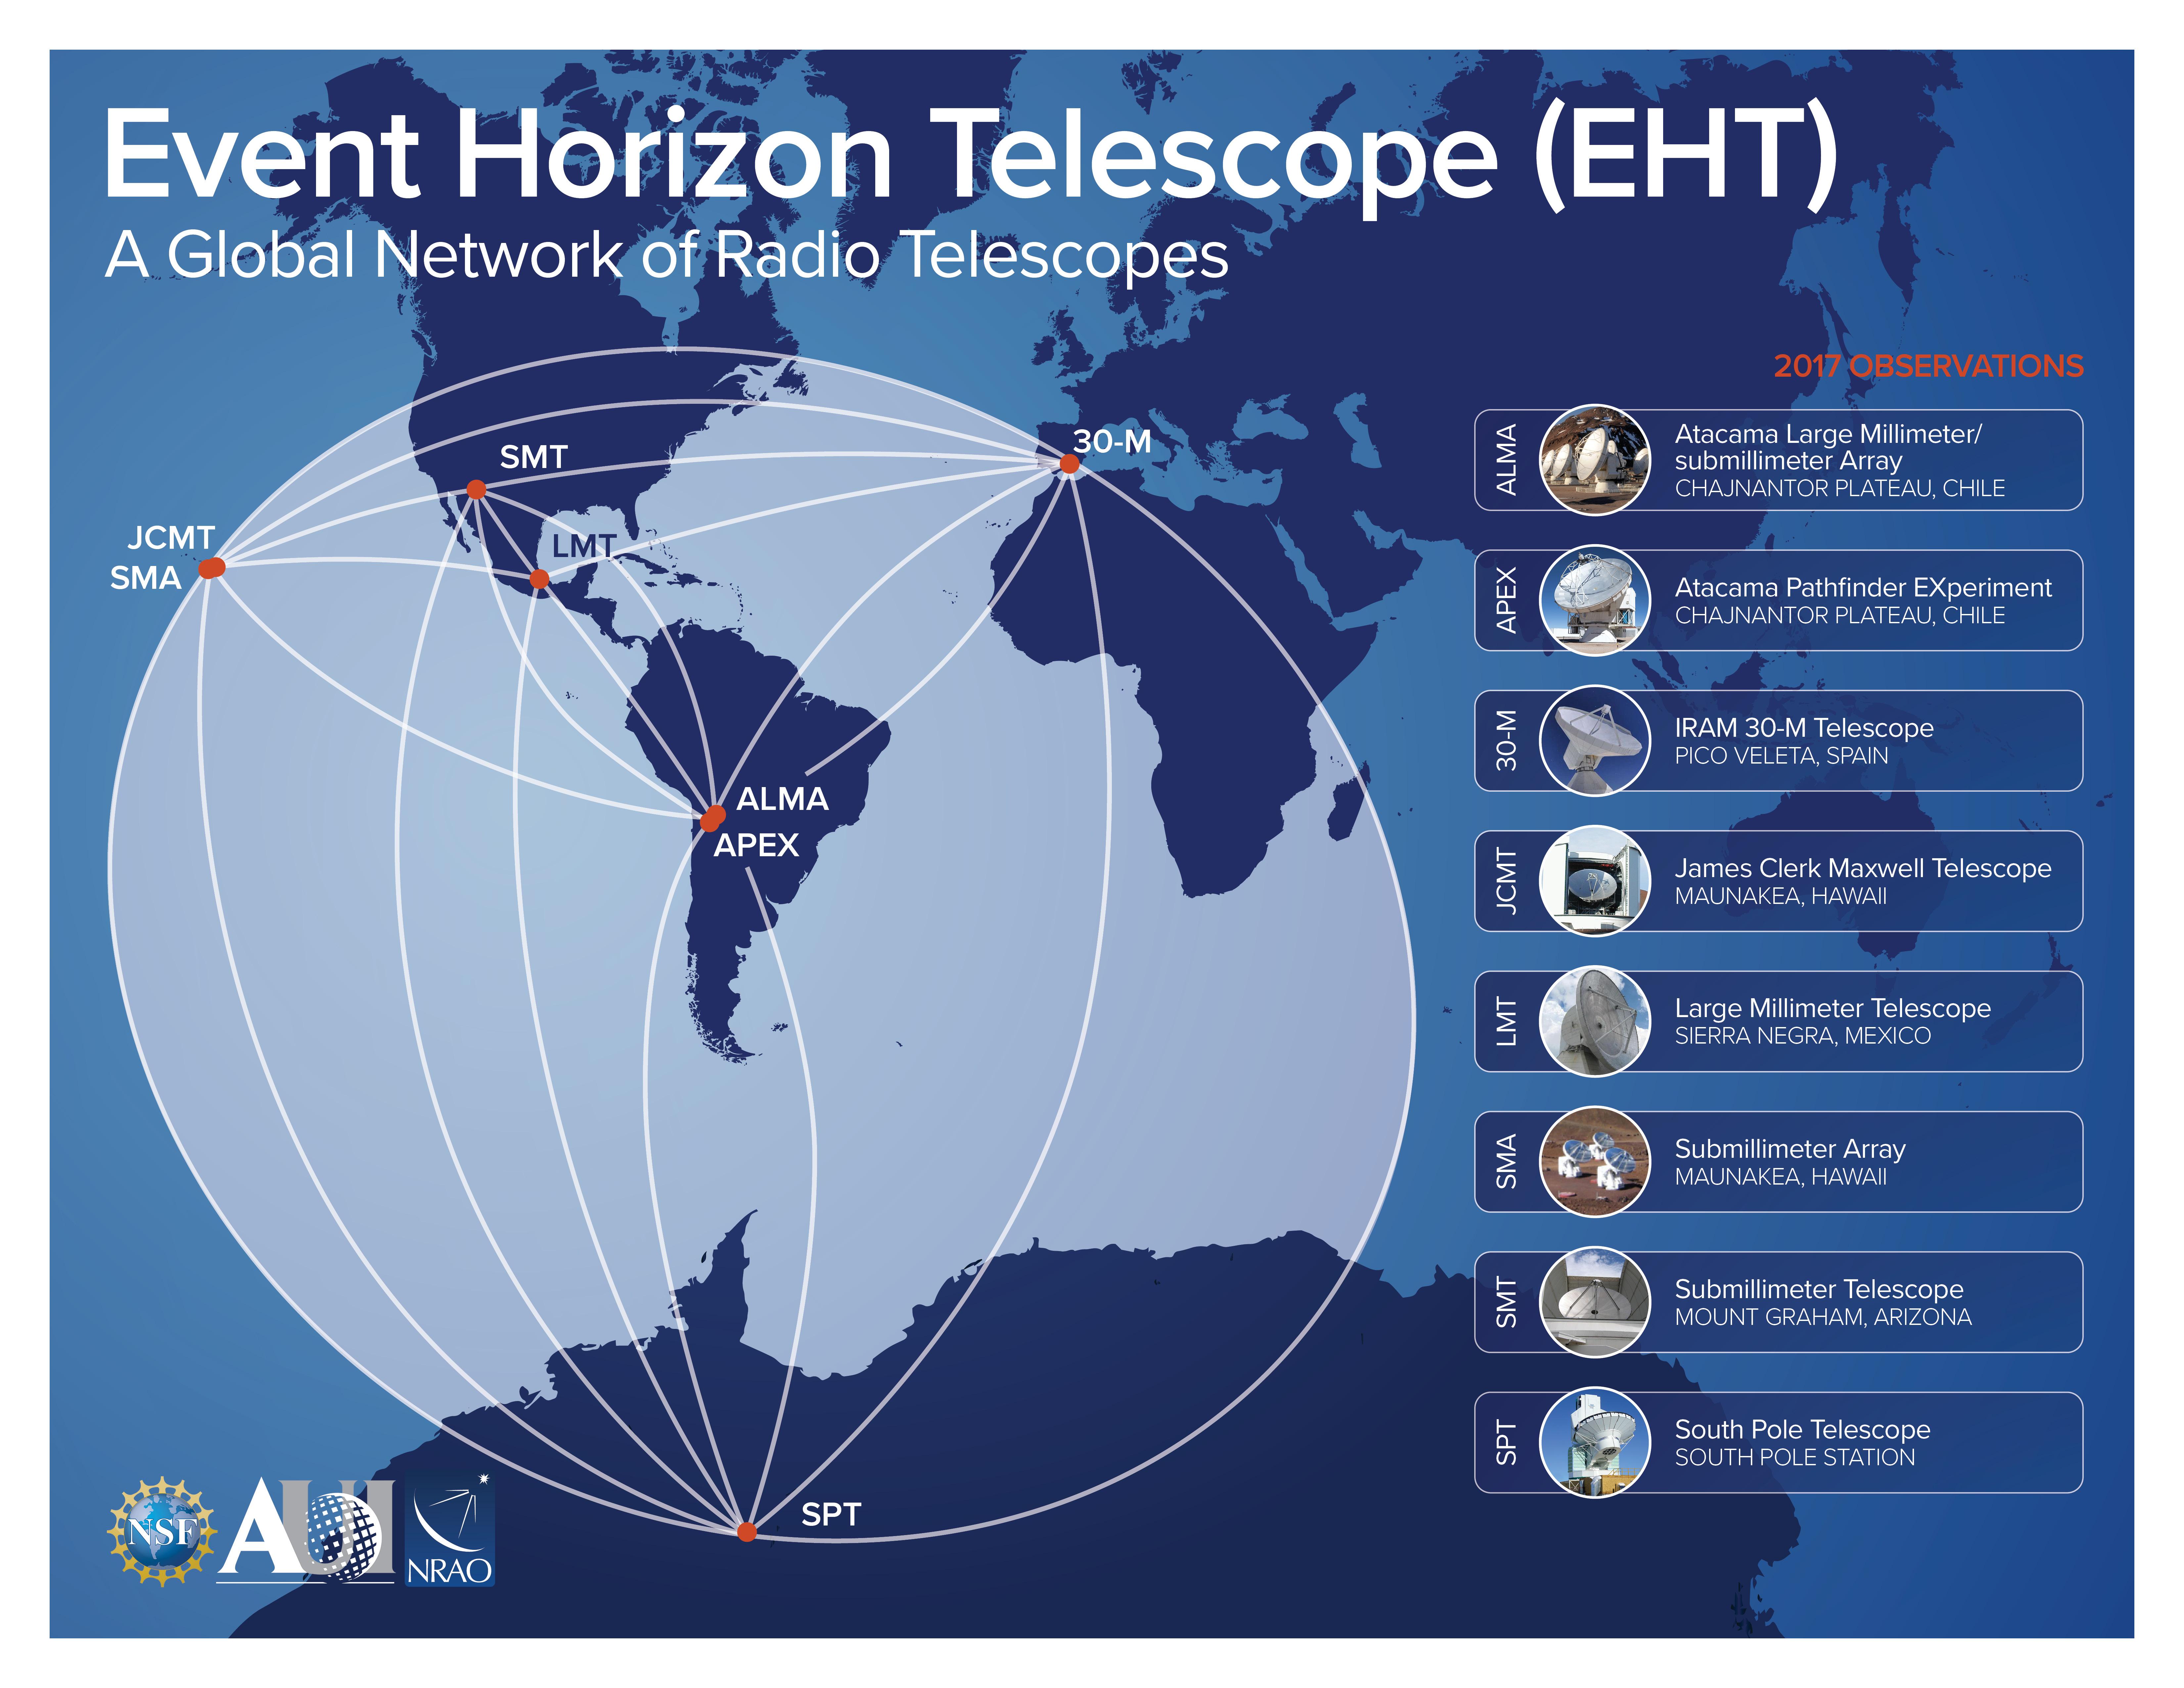 The Event Horizon Telescope – A Global Network of Radio Telescopes